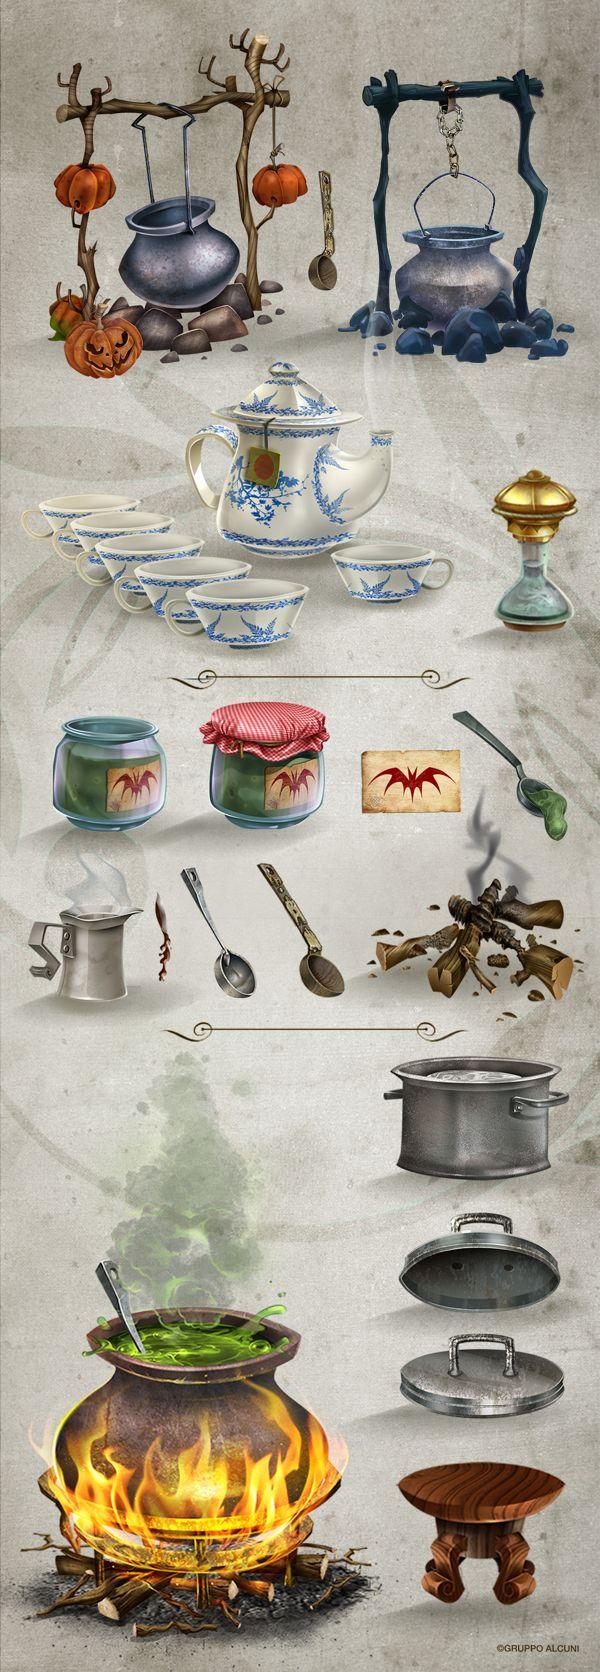 Illustration | Objects